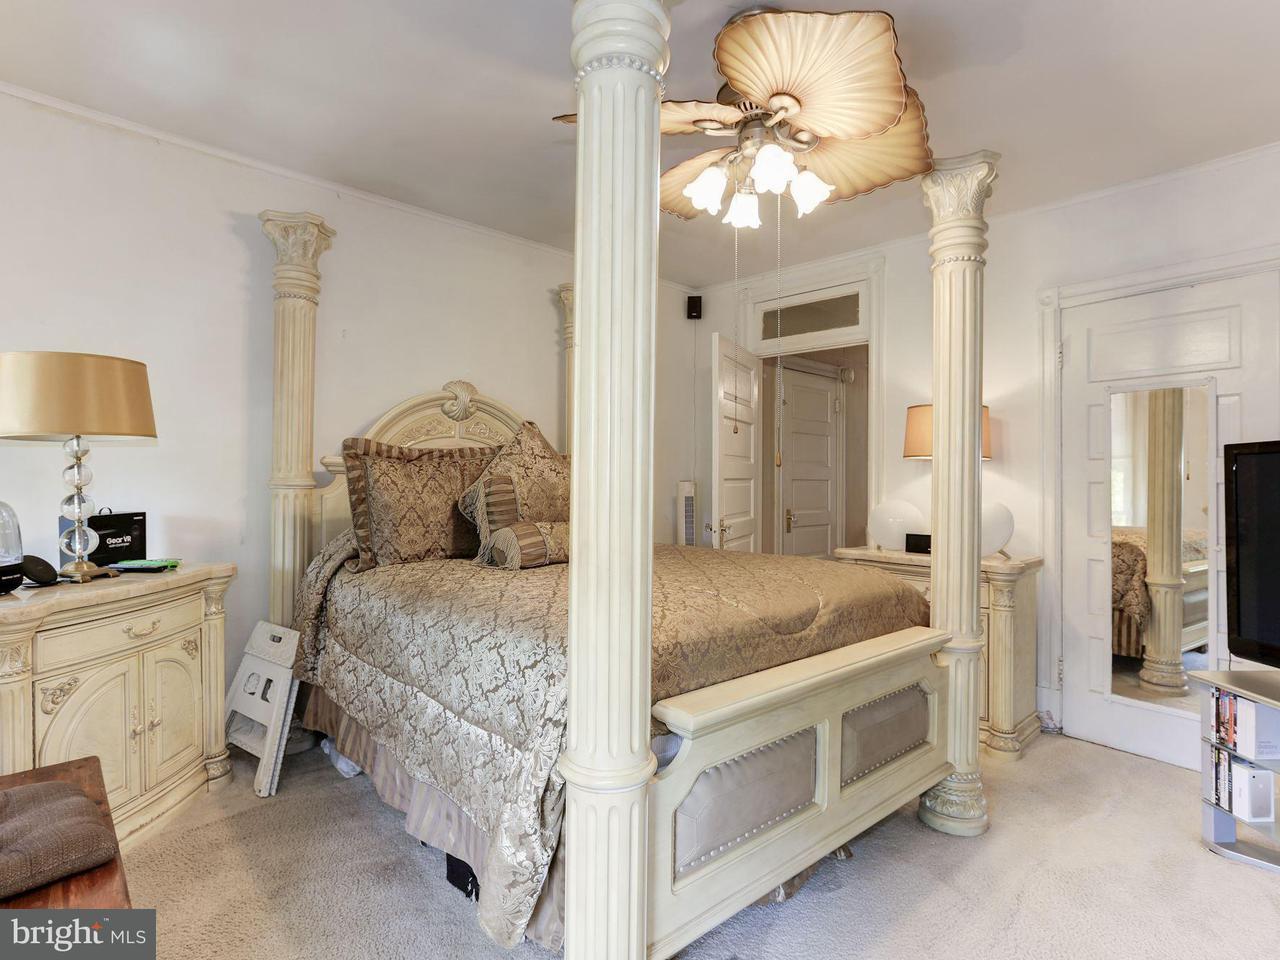 Additional photo for property listing at 304 16th St Se 304 16th St Se Washington, Distrito De Columbia 20003 Estados Unidos